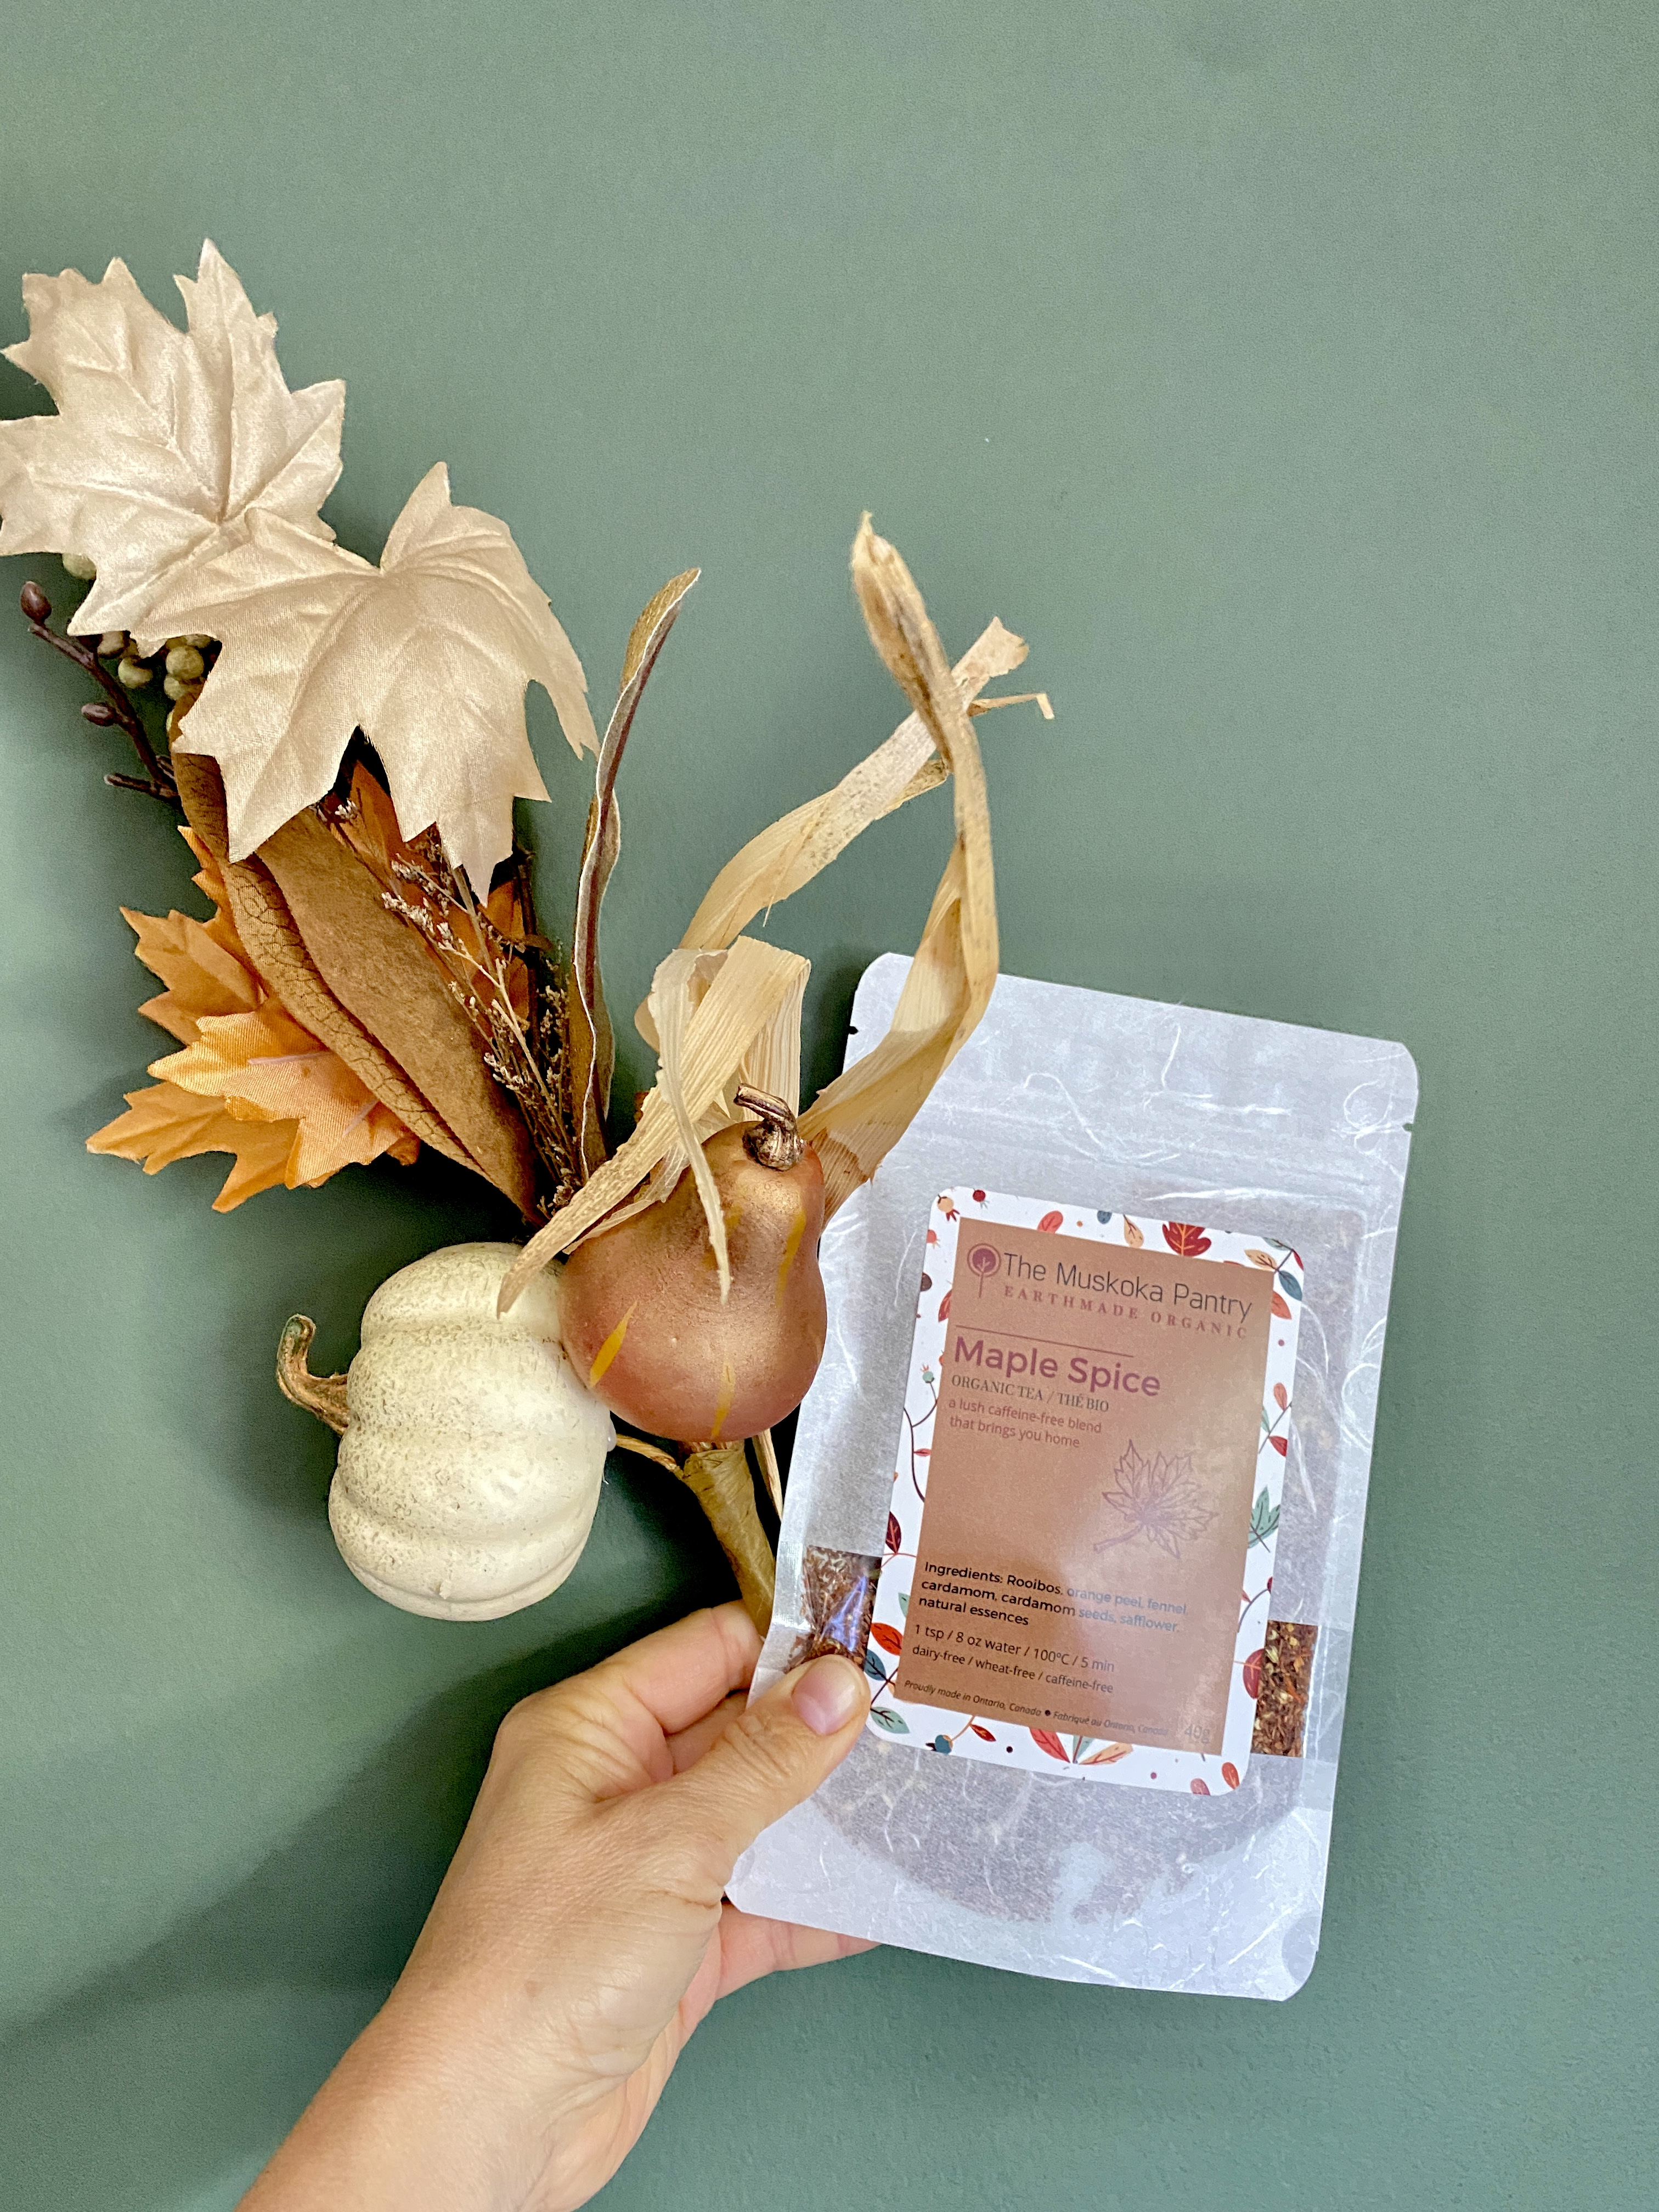 Red Maple Spice Herbal Tisane Tea